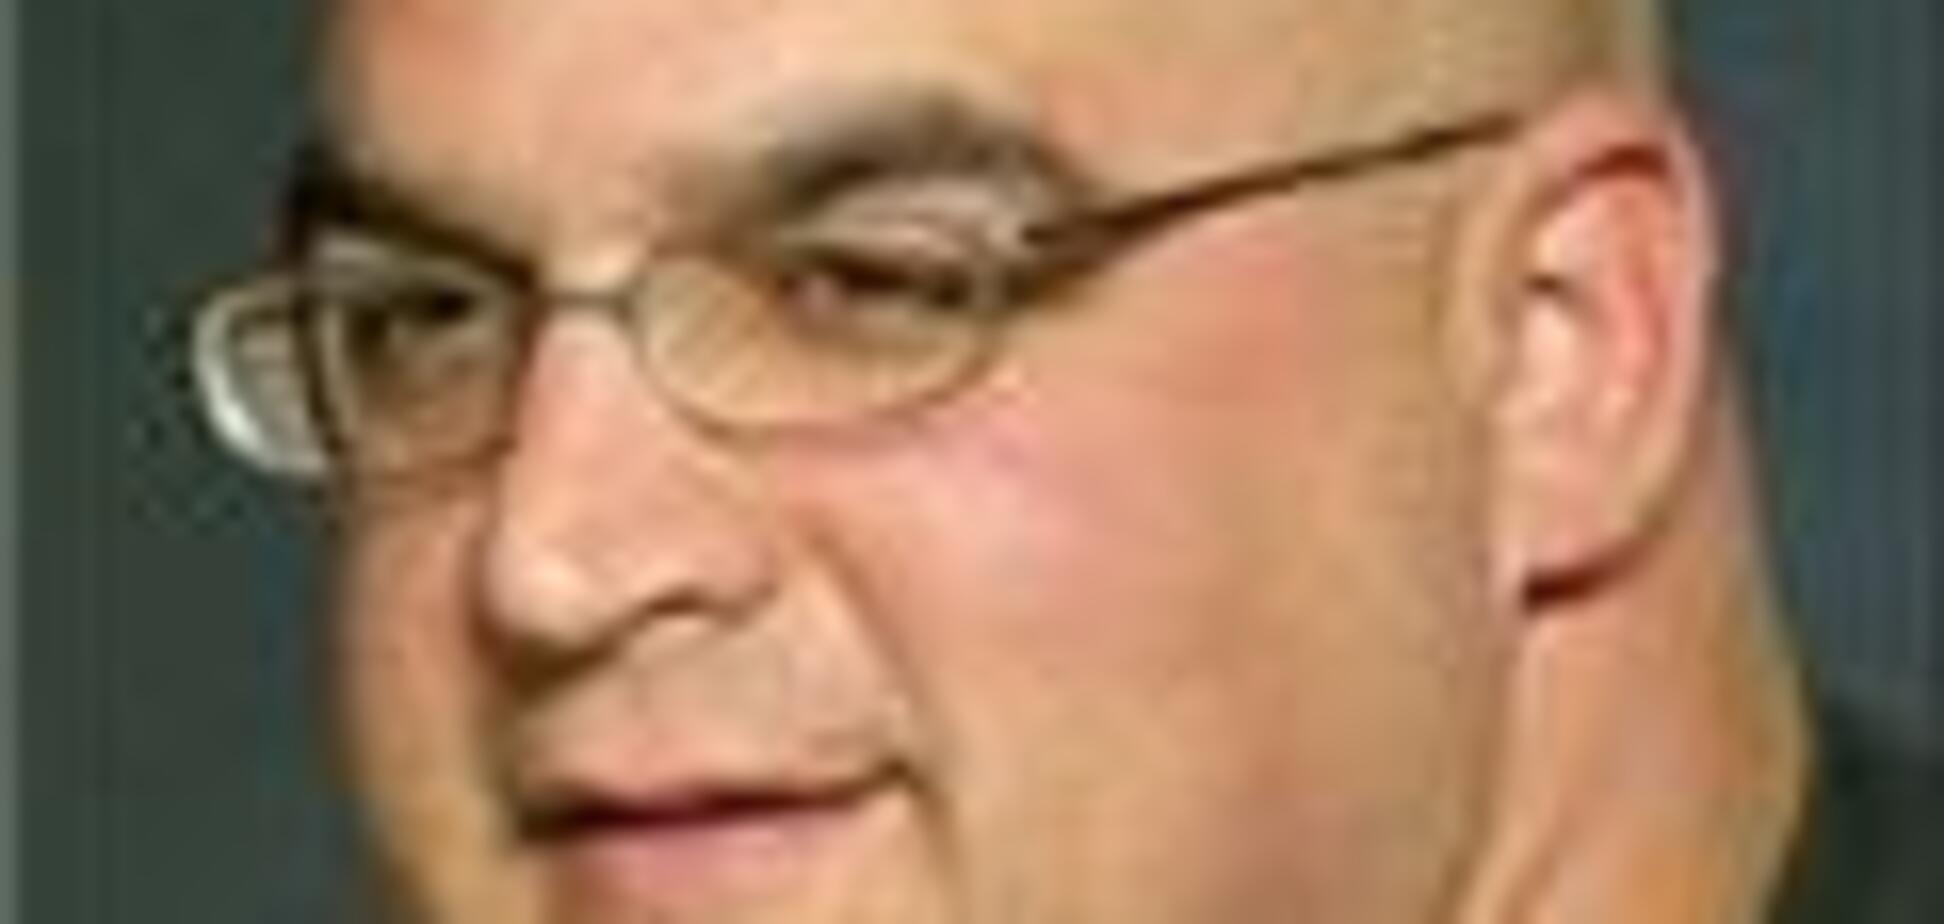 Сина екс-прем'єра Ізраїлю випустили з в'язниці